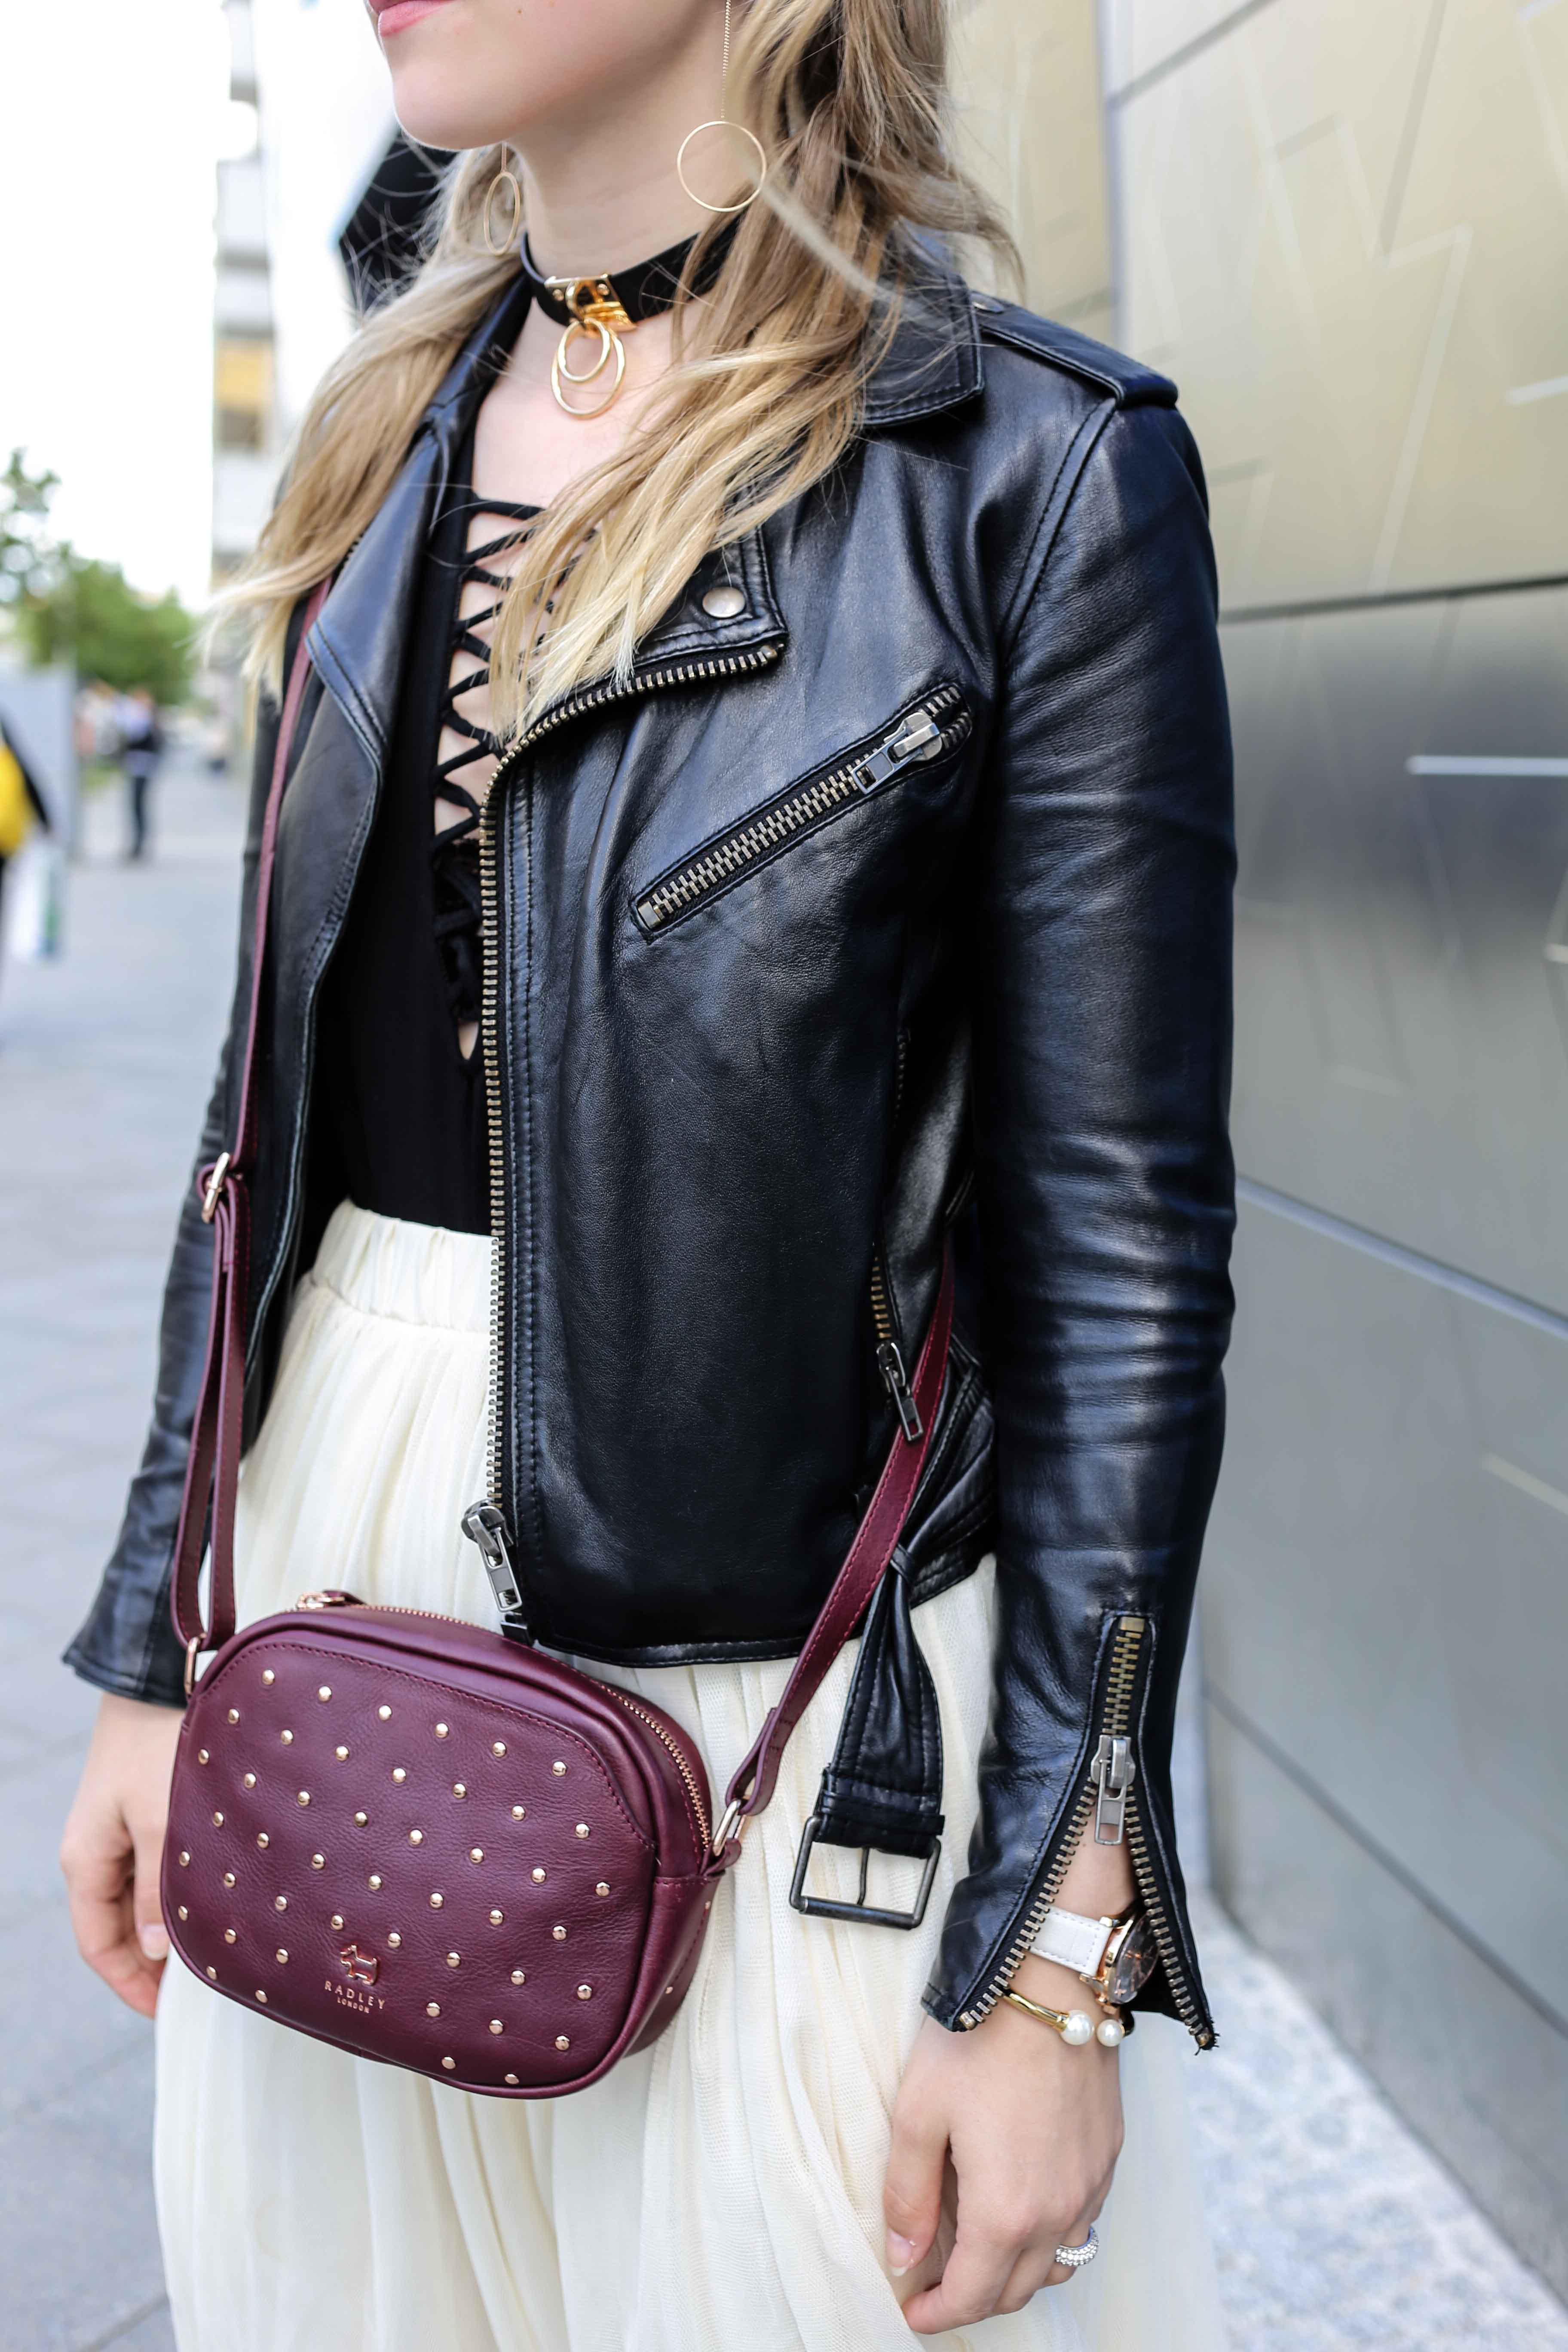 fashion-week-look-schnürbody-plisseerock-retro-sonnenbrille-fashionblog-modeblog-berlin-köln_8753